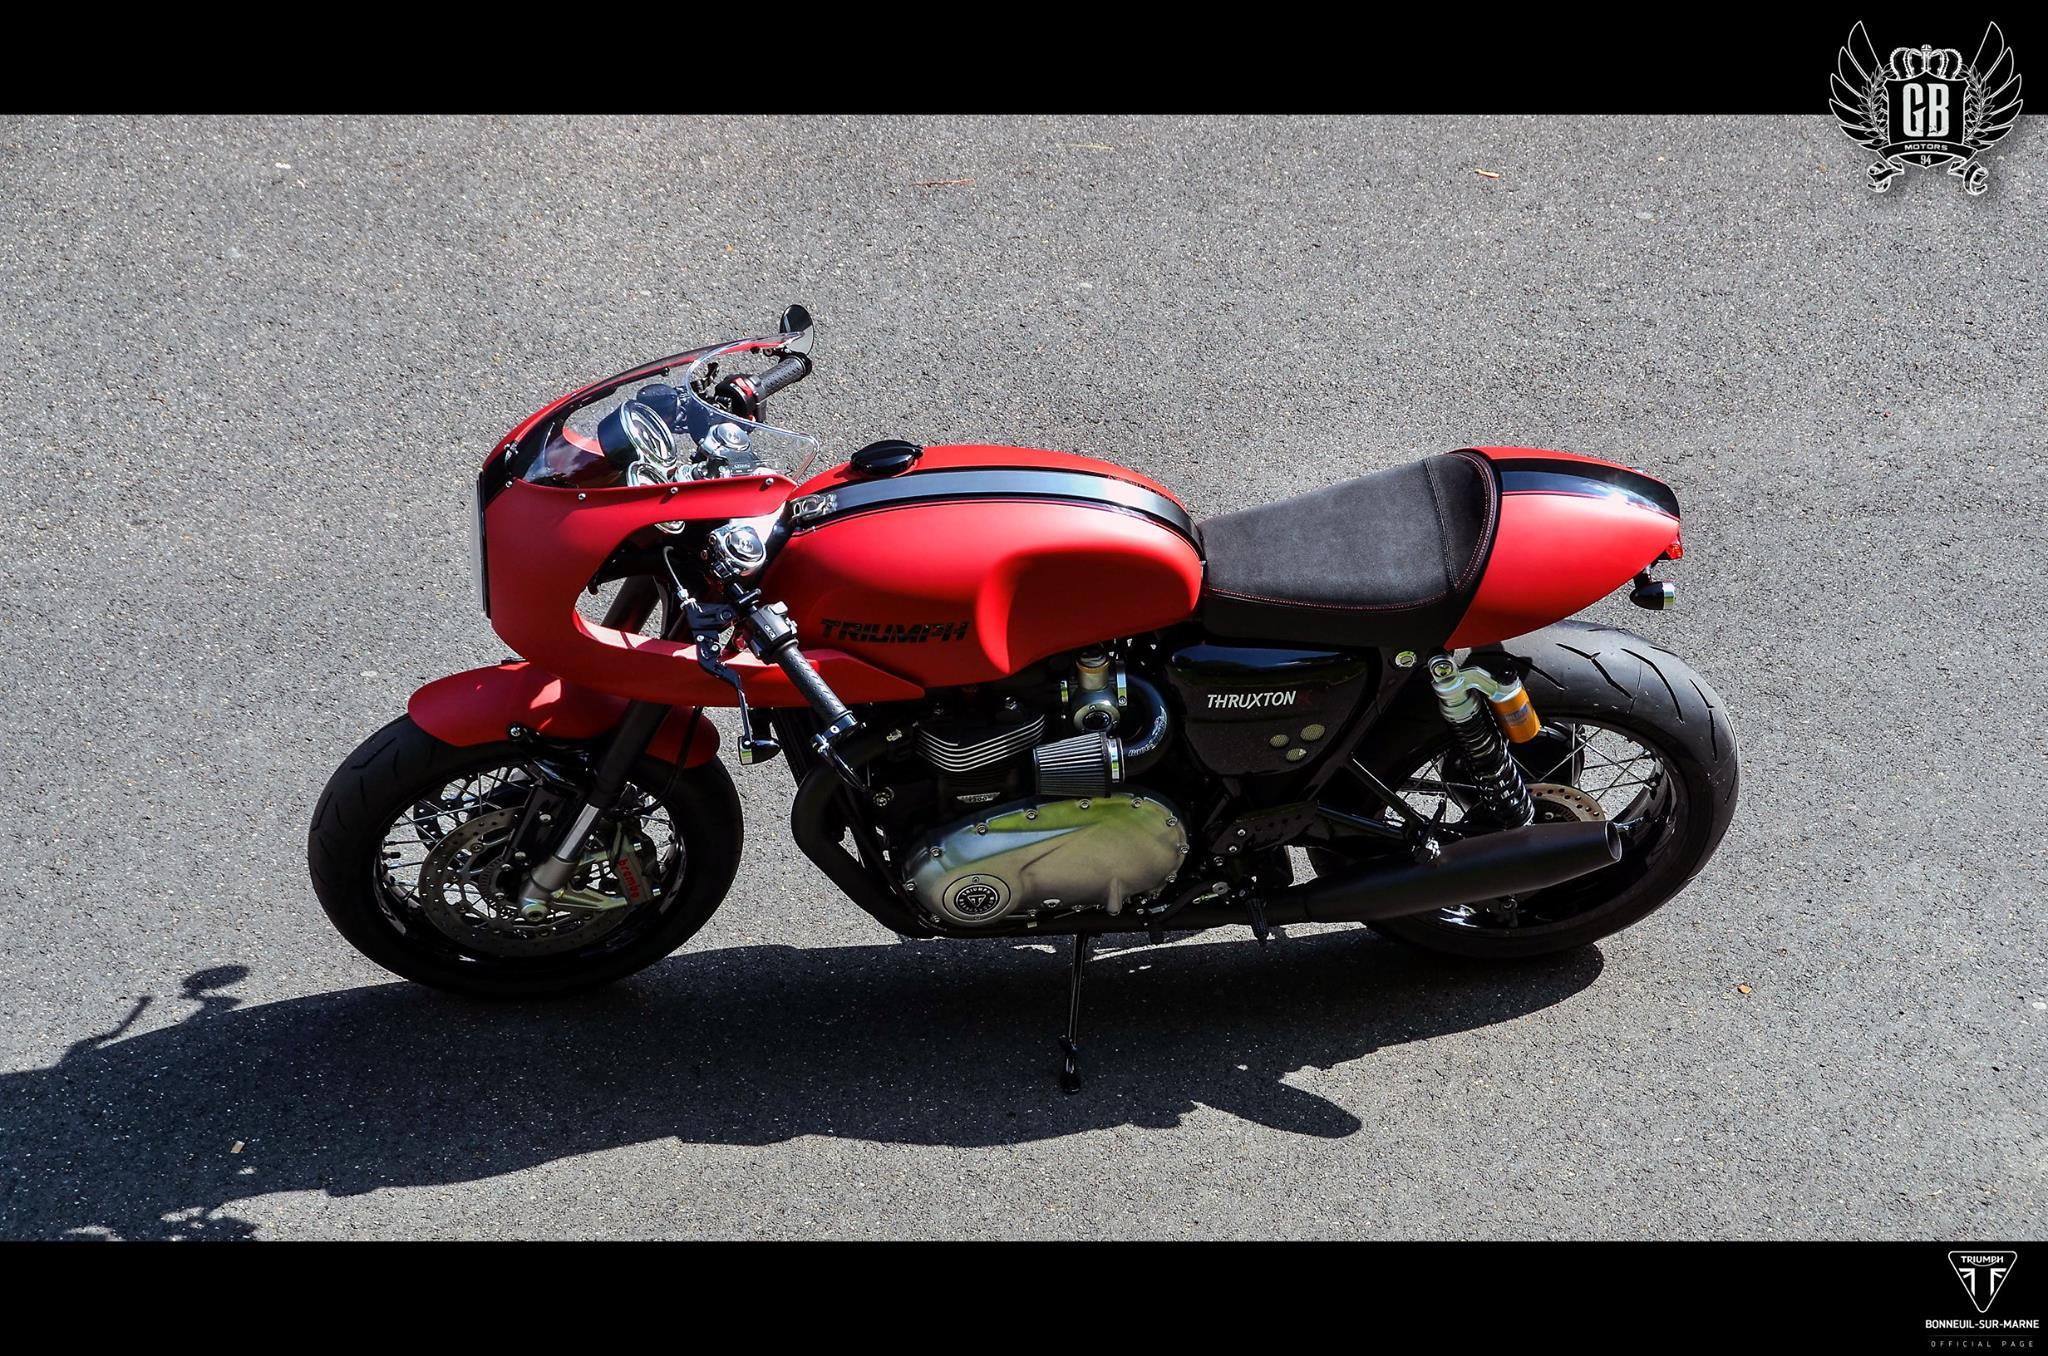 Triumph GB Motors 94 8